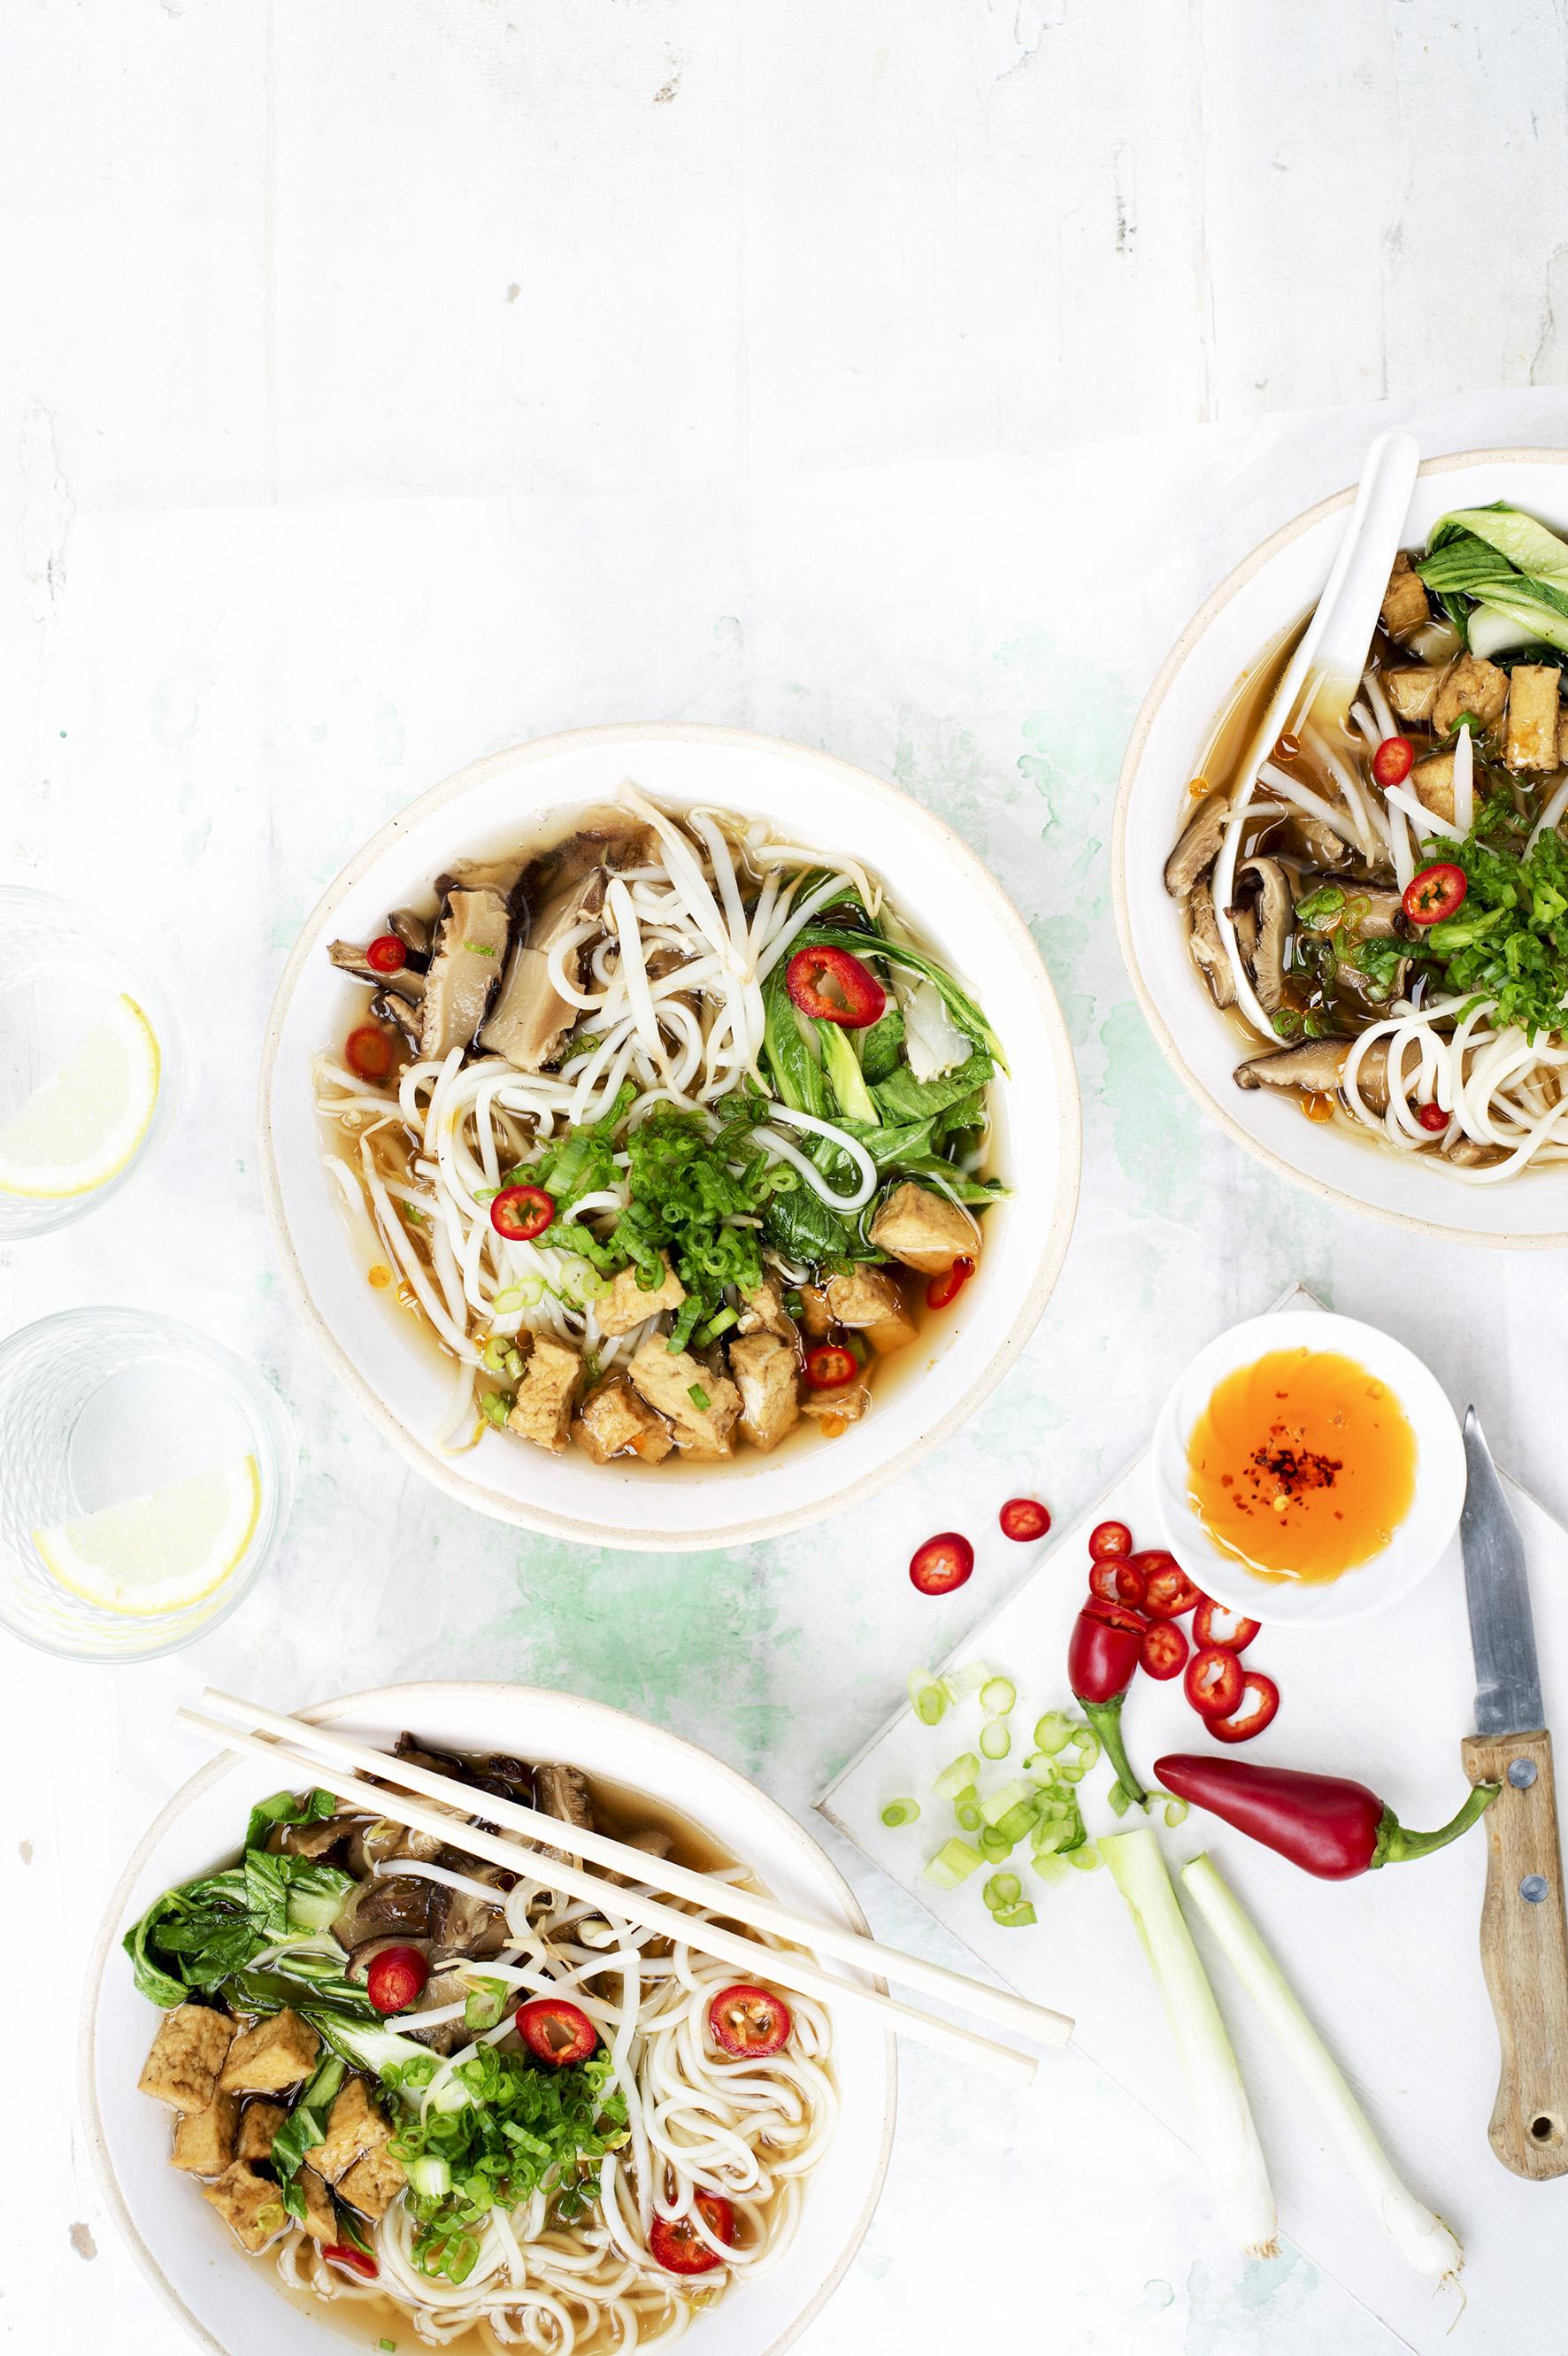 Vegan Ramen Recipe with Chilli and Tofu